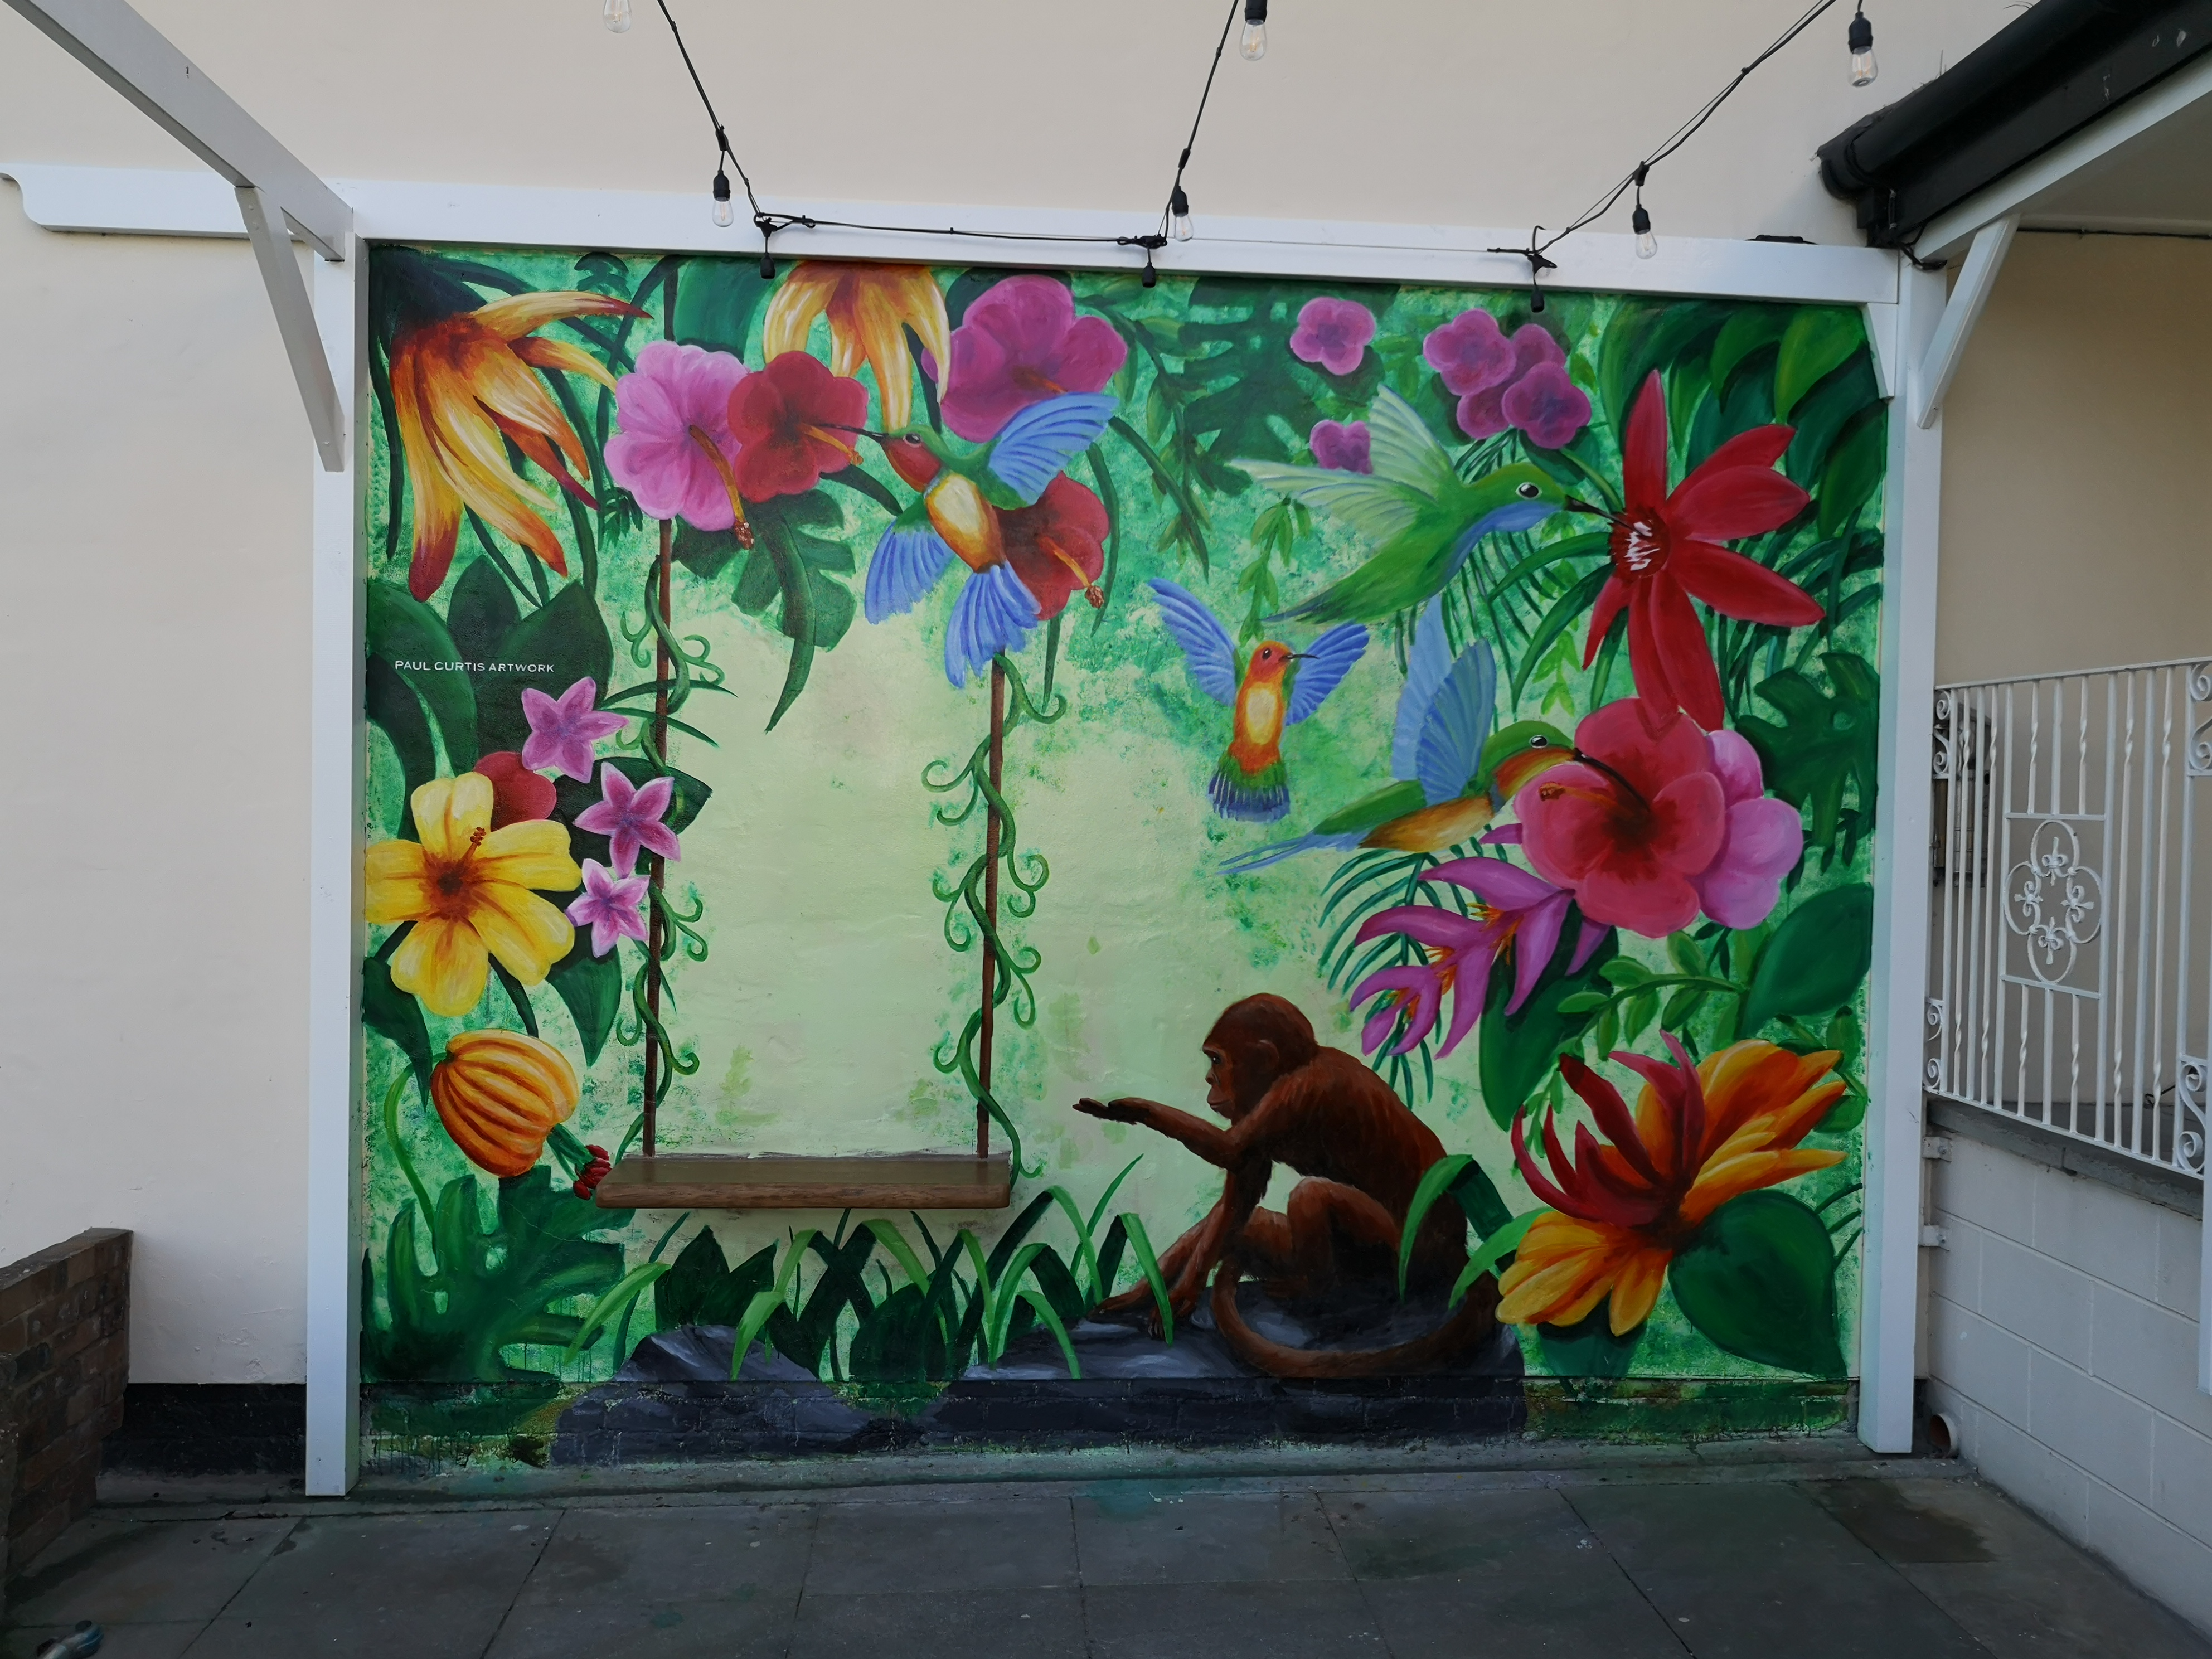 Thornton Hall Art